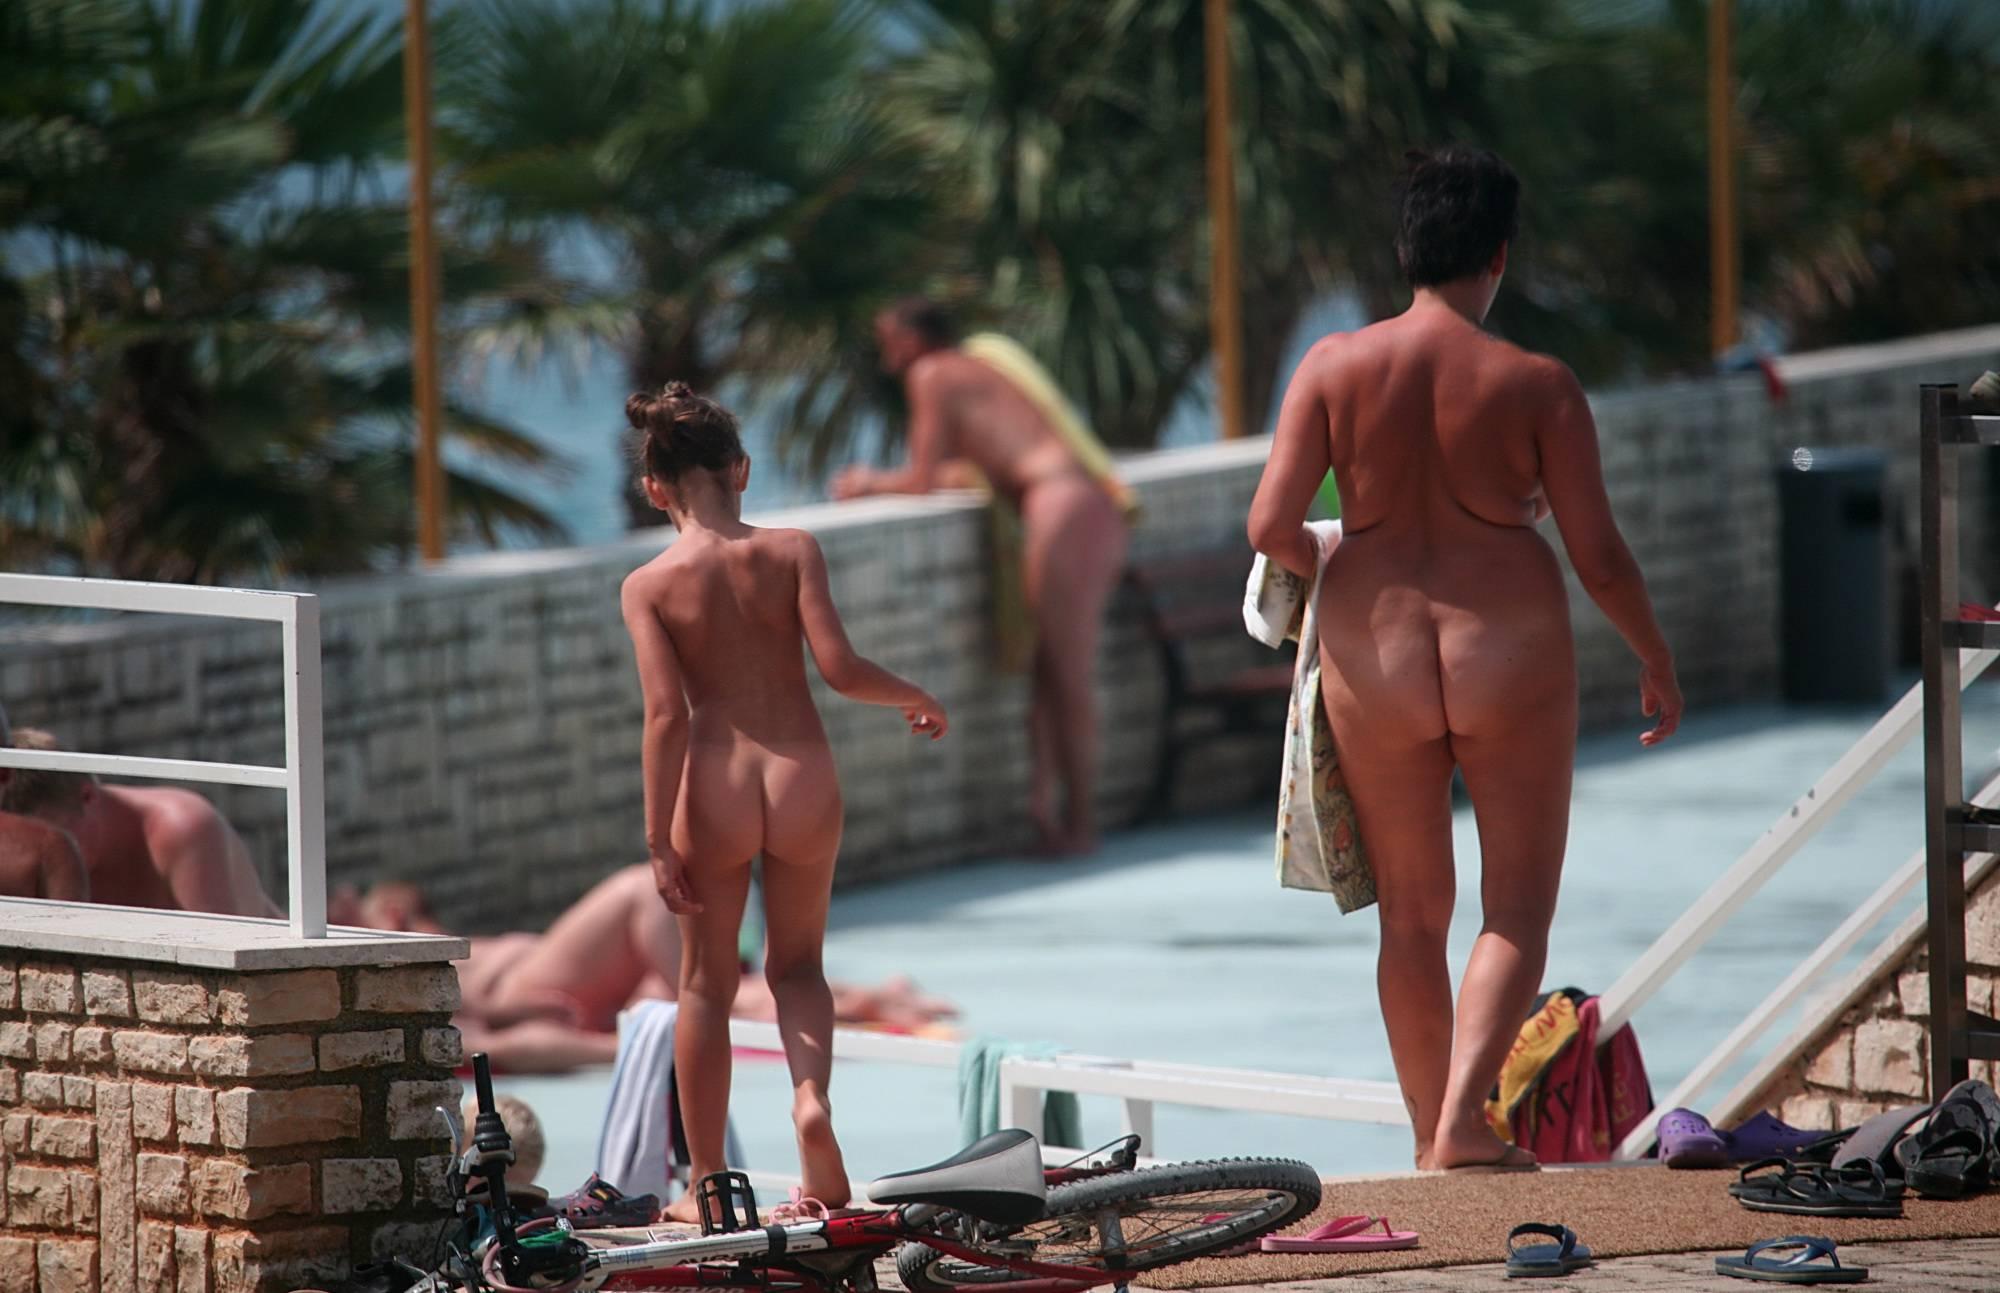 Nudist Pics Good Friends by the Pool - 1